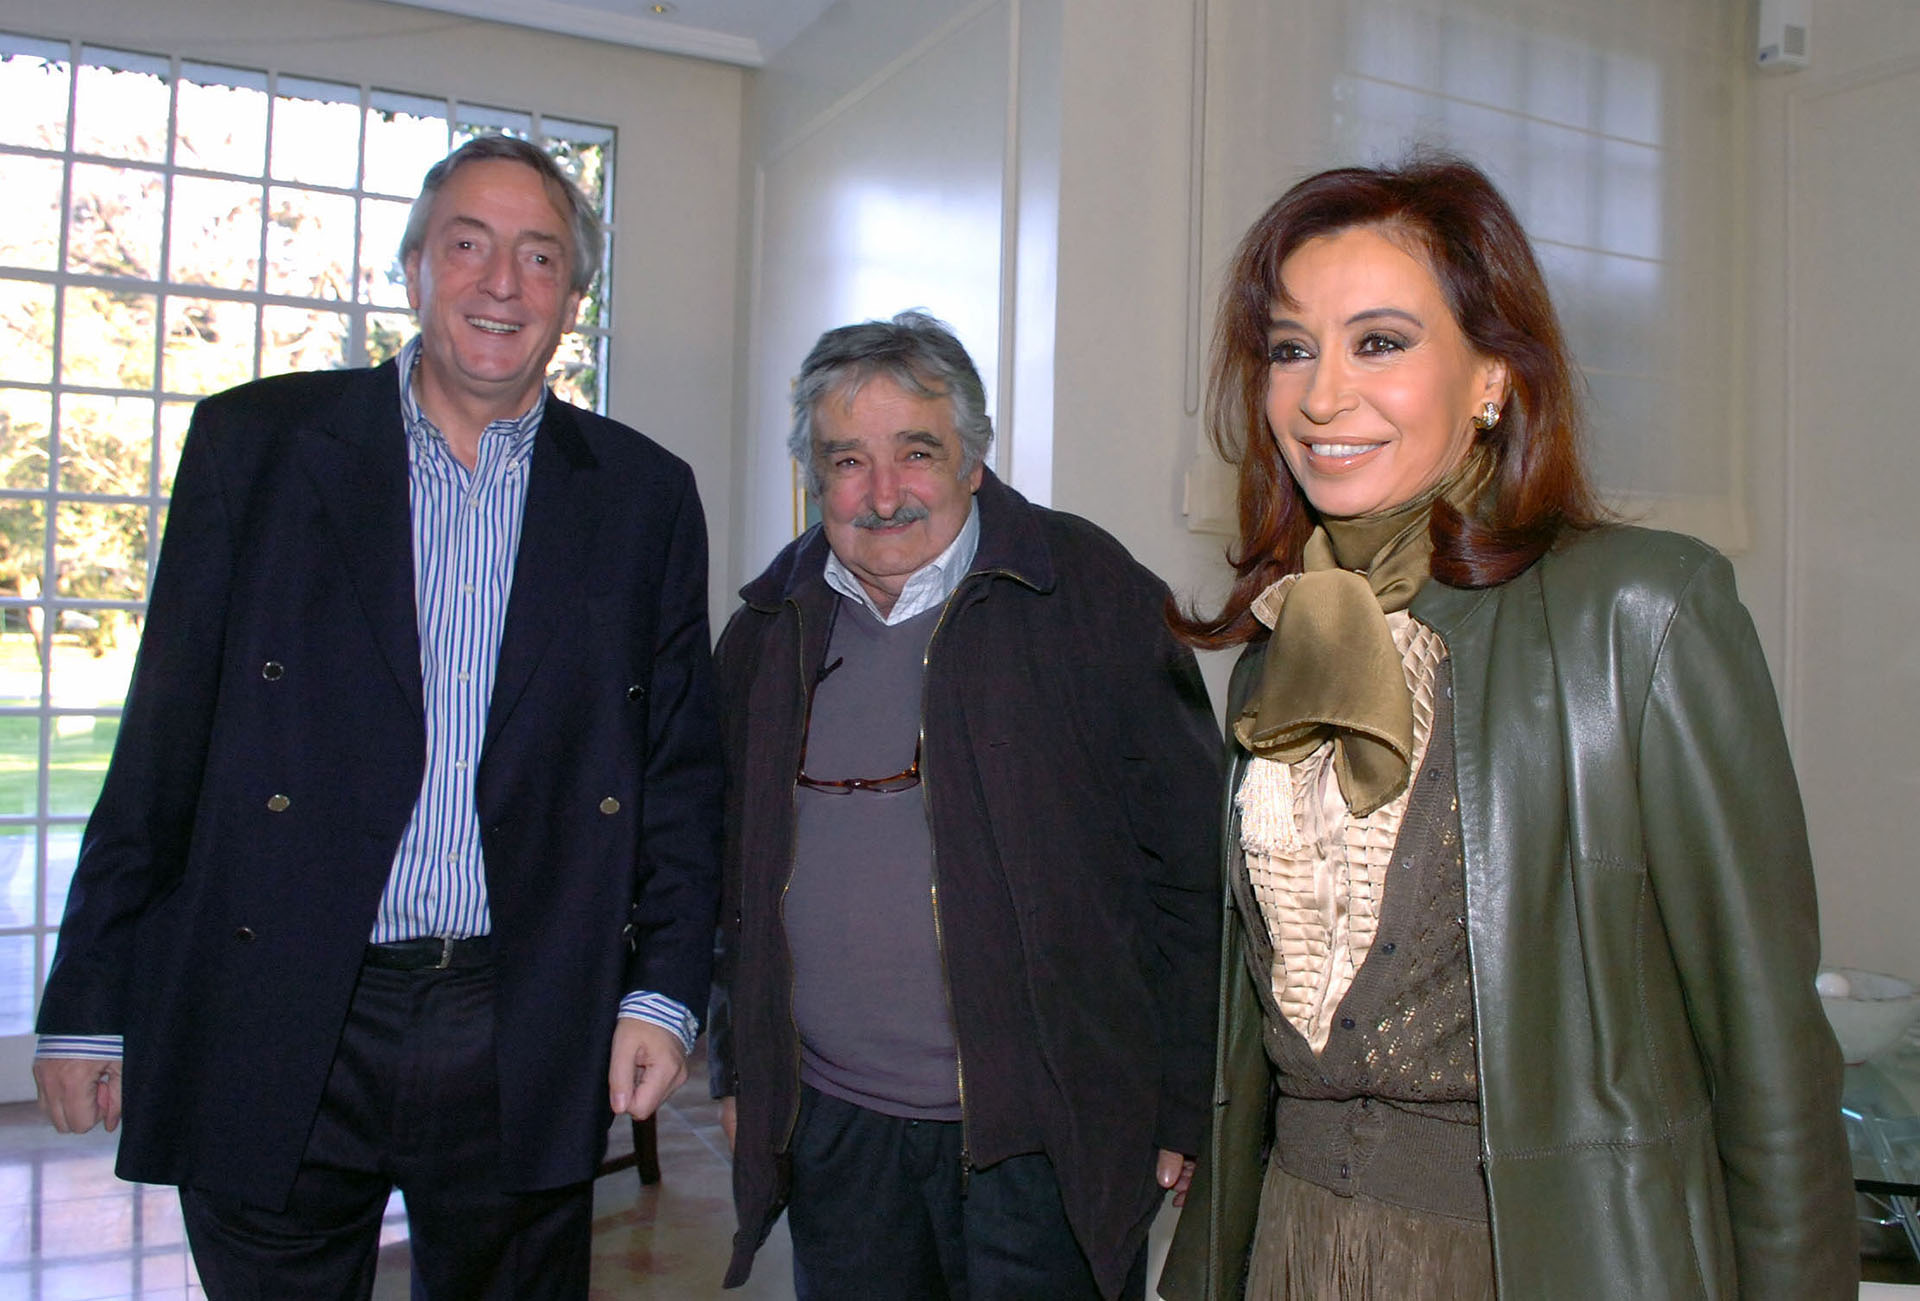 La presidentaCristina Kirchnery su esposoNéstor Kirchner reciben en la quinta de Olivos al senador uruguayo, José Mujica